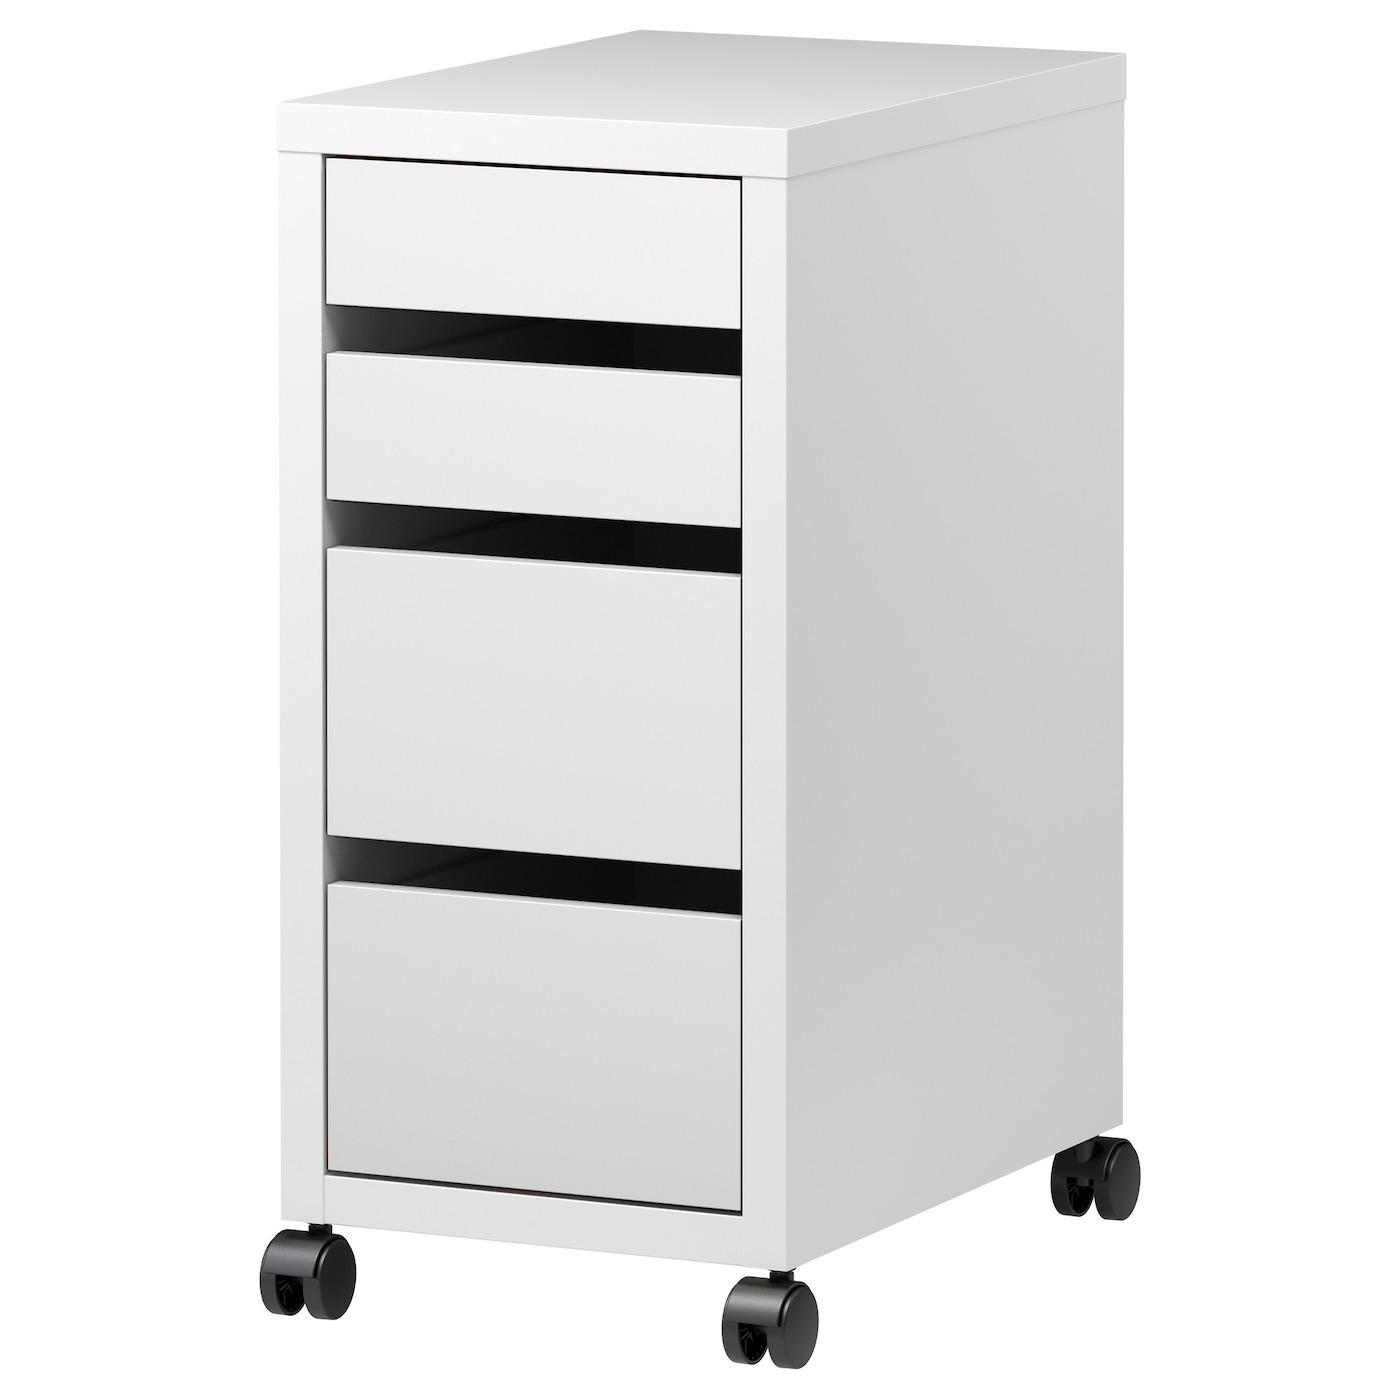 micke caisson tiroirs sur roulettes blanc 35 x 75 cm ikea. Black Bedroom Furniture Sets. Home Design Ideas